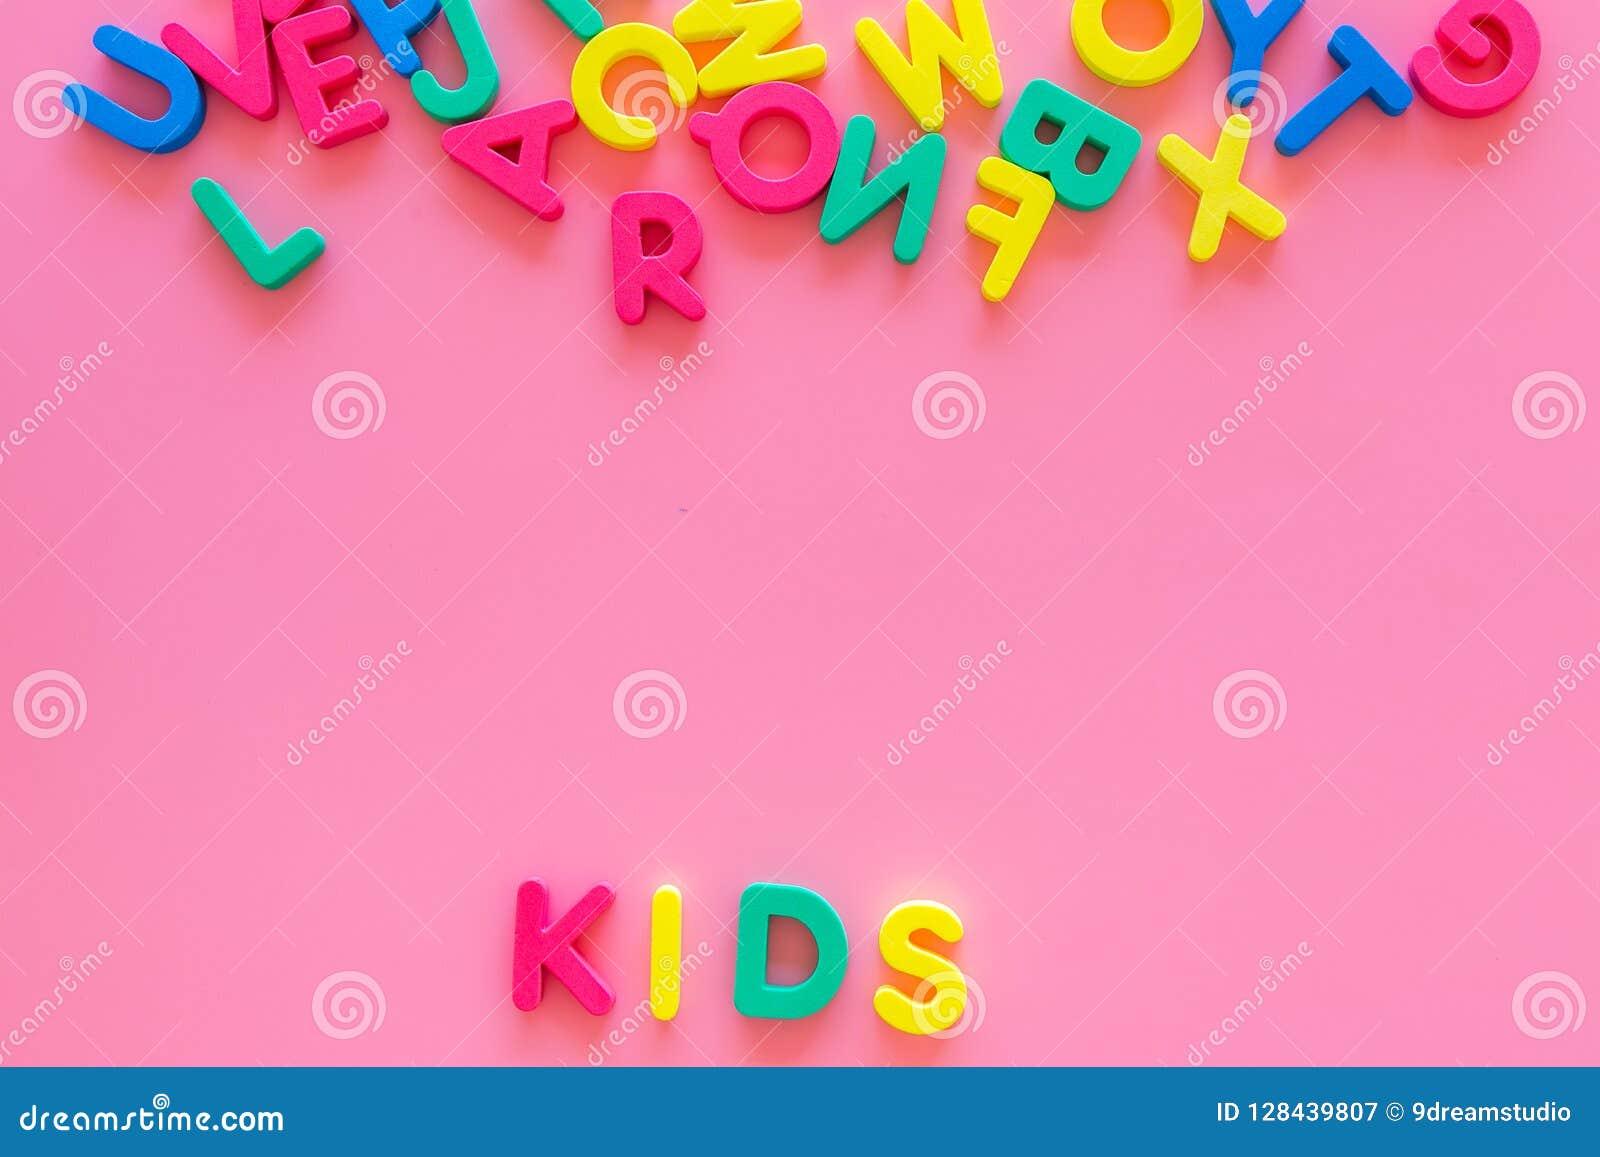 Early Childhood Development Concept  Word Kids Written By